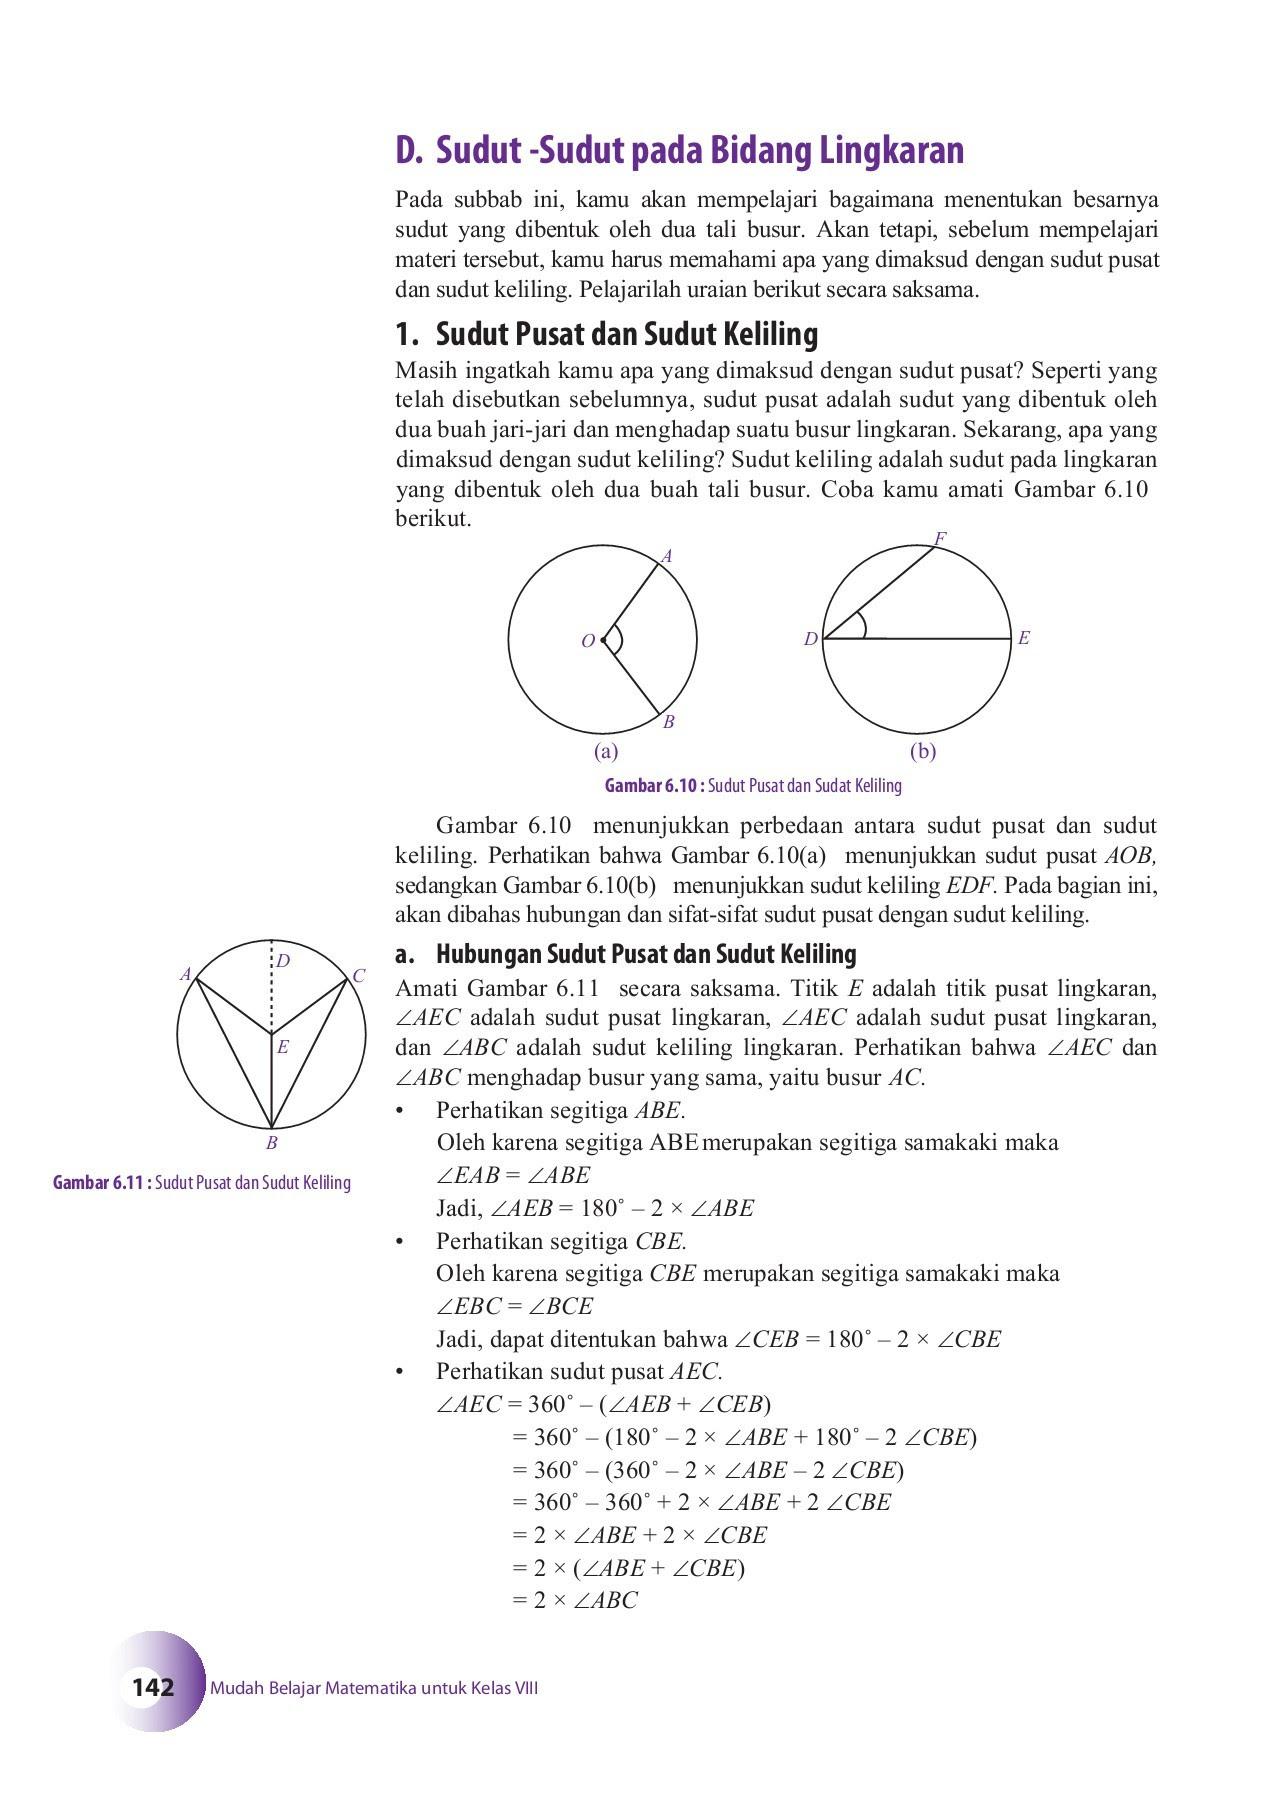 Mudah Belajar Matematika kelas VIII Pages 151 200 Text Version